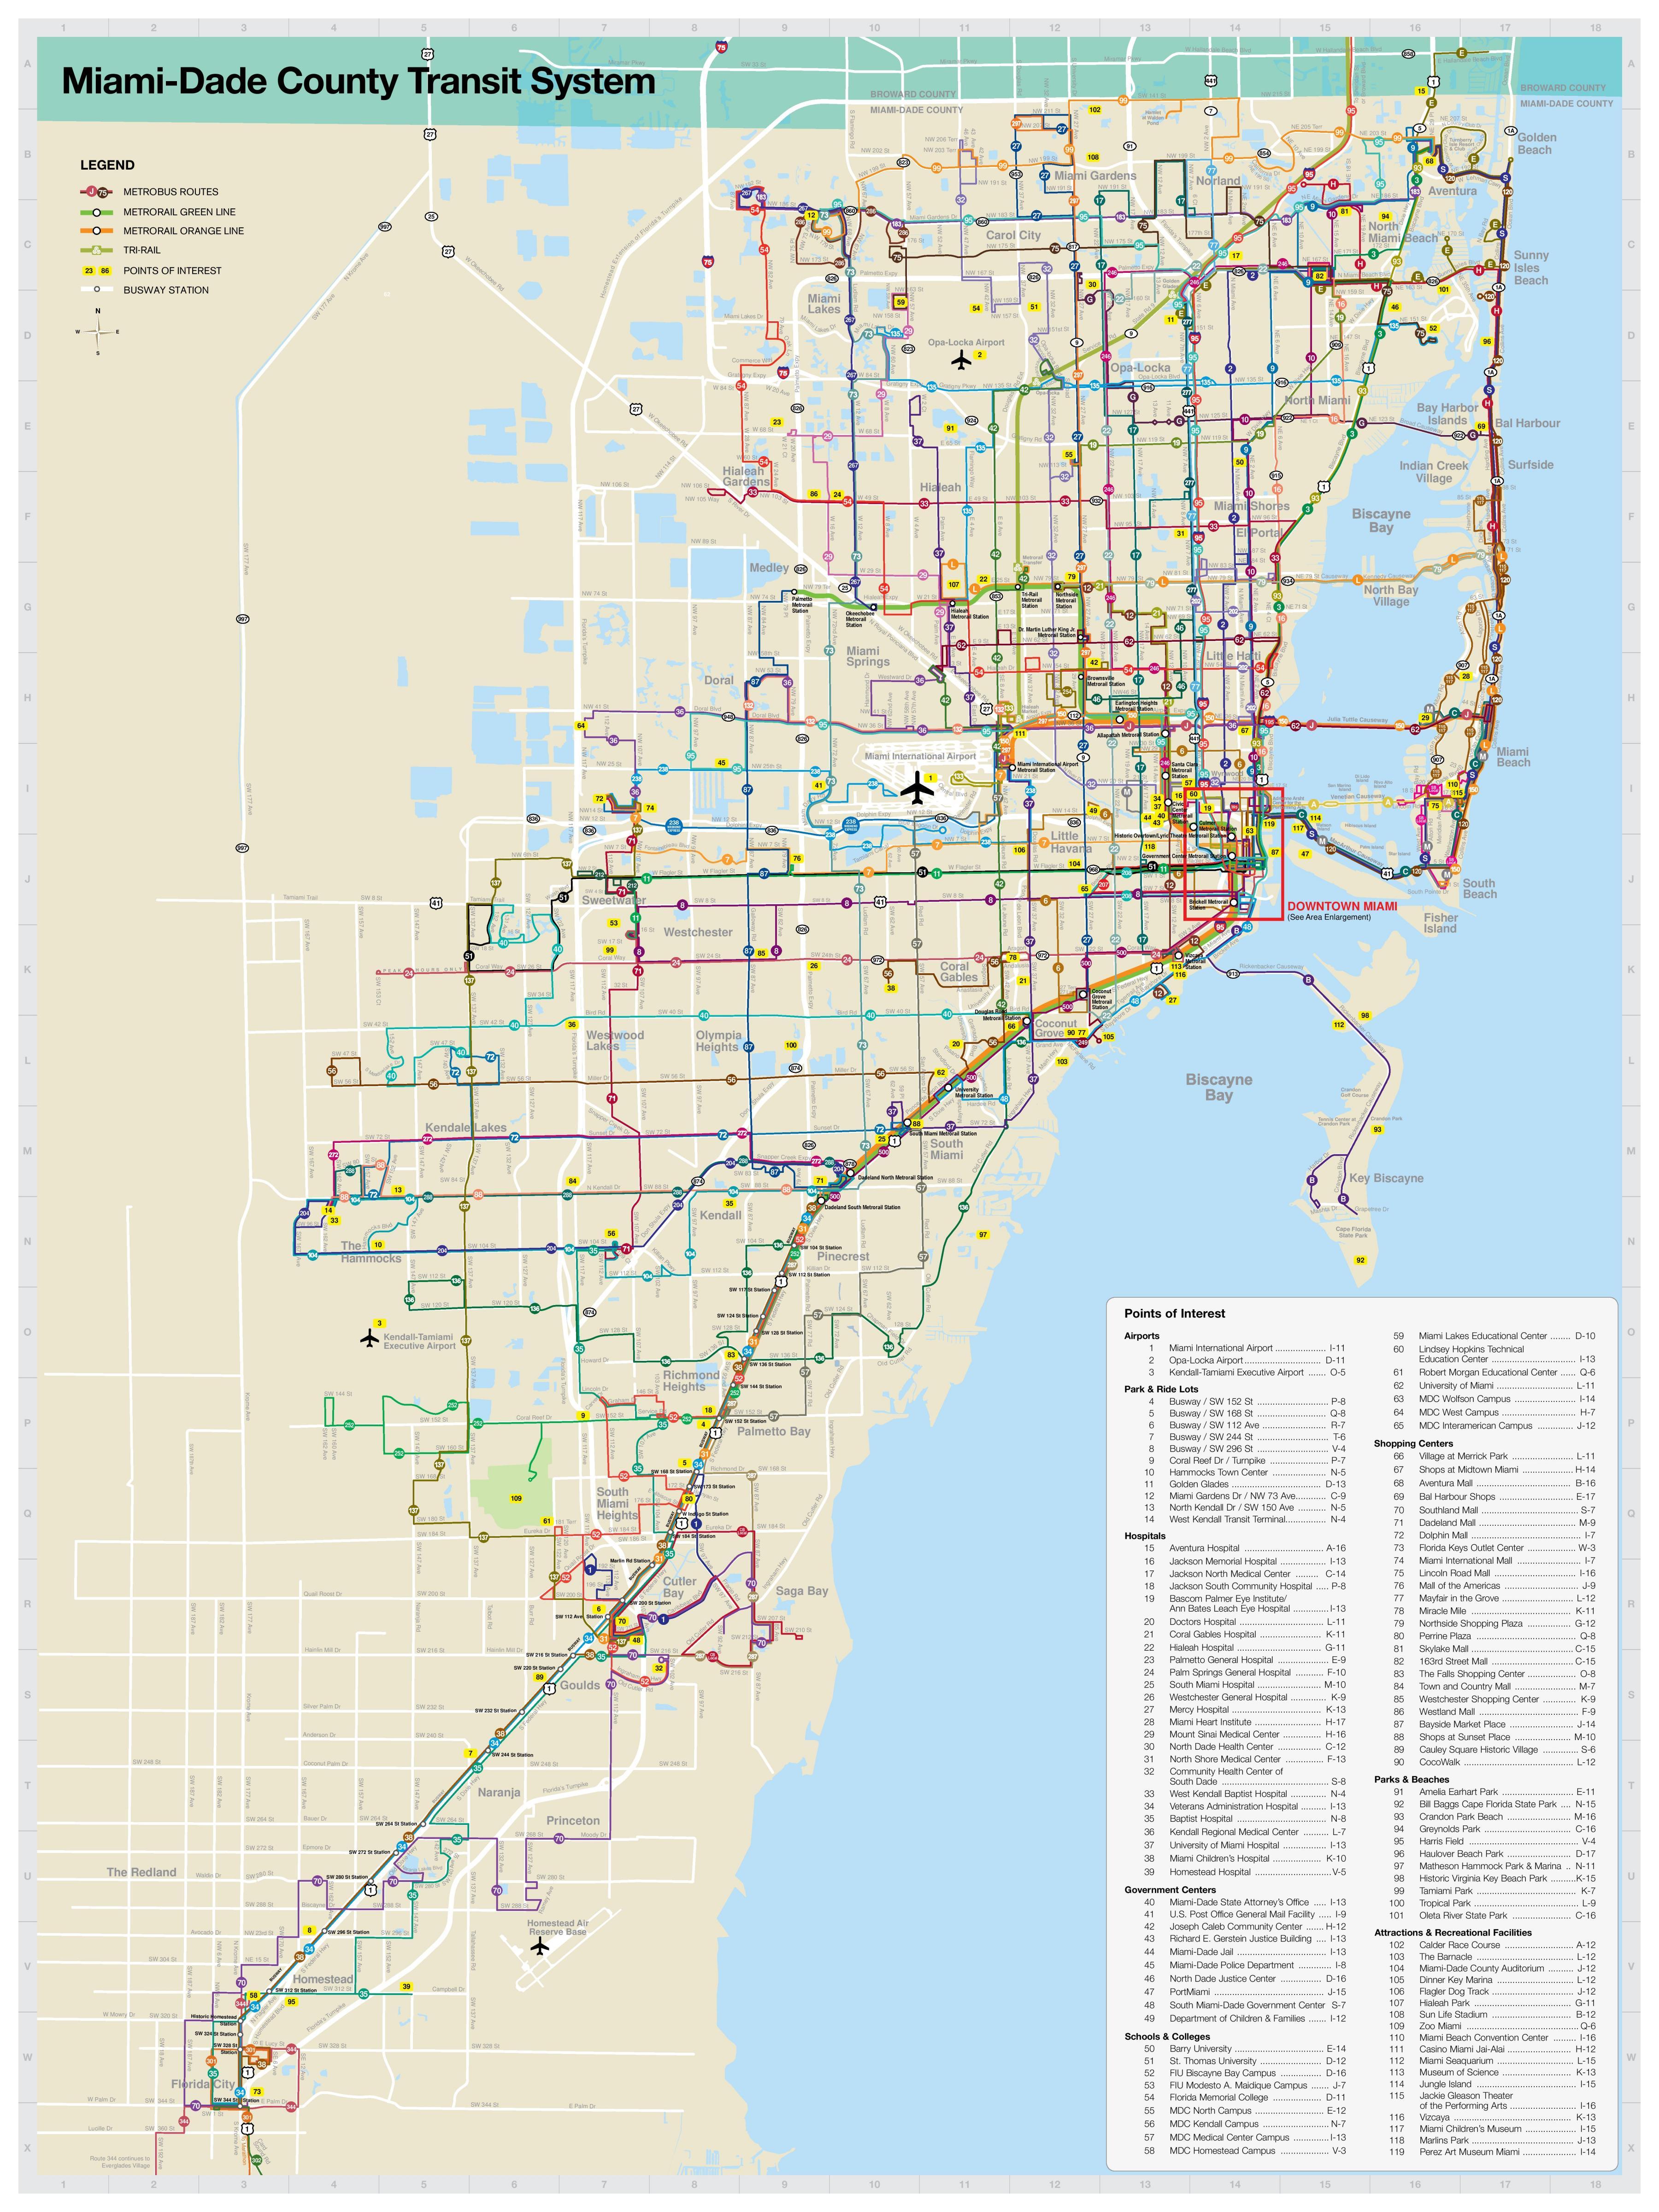 miami transit map - miami public transit map (florida - usa)